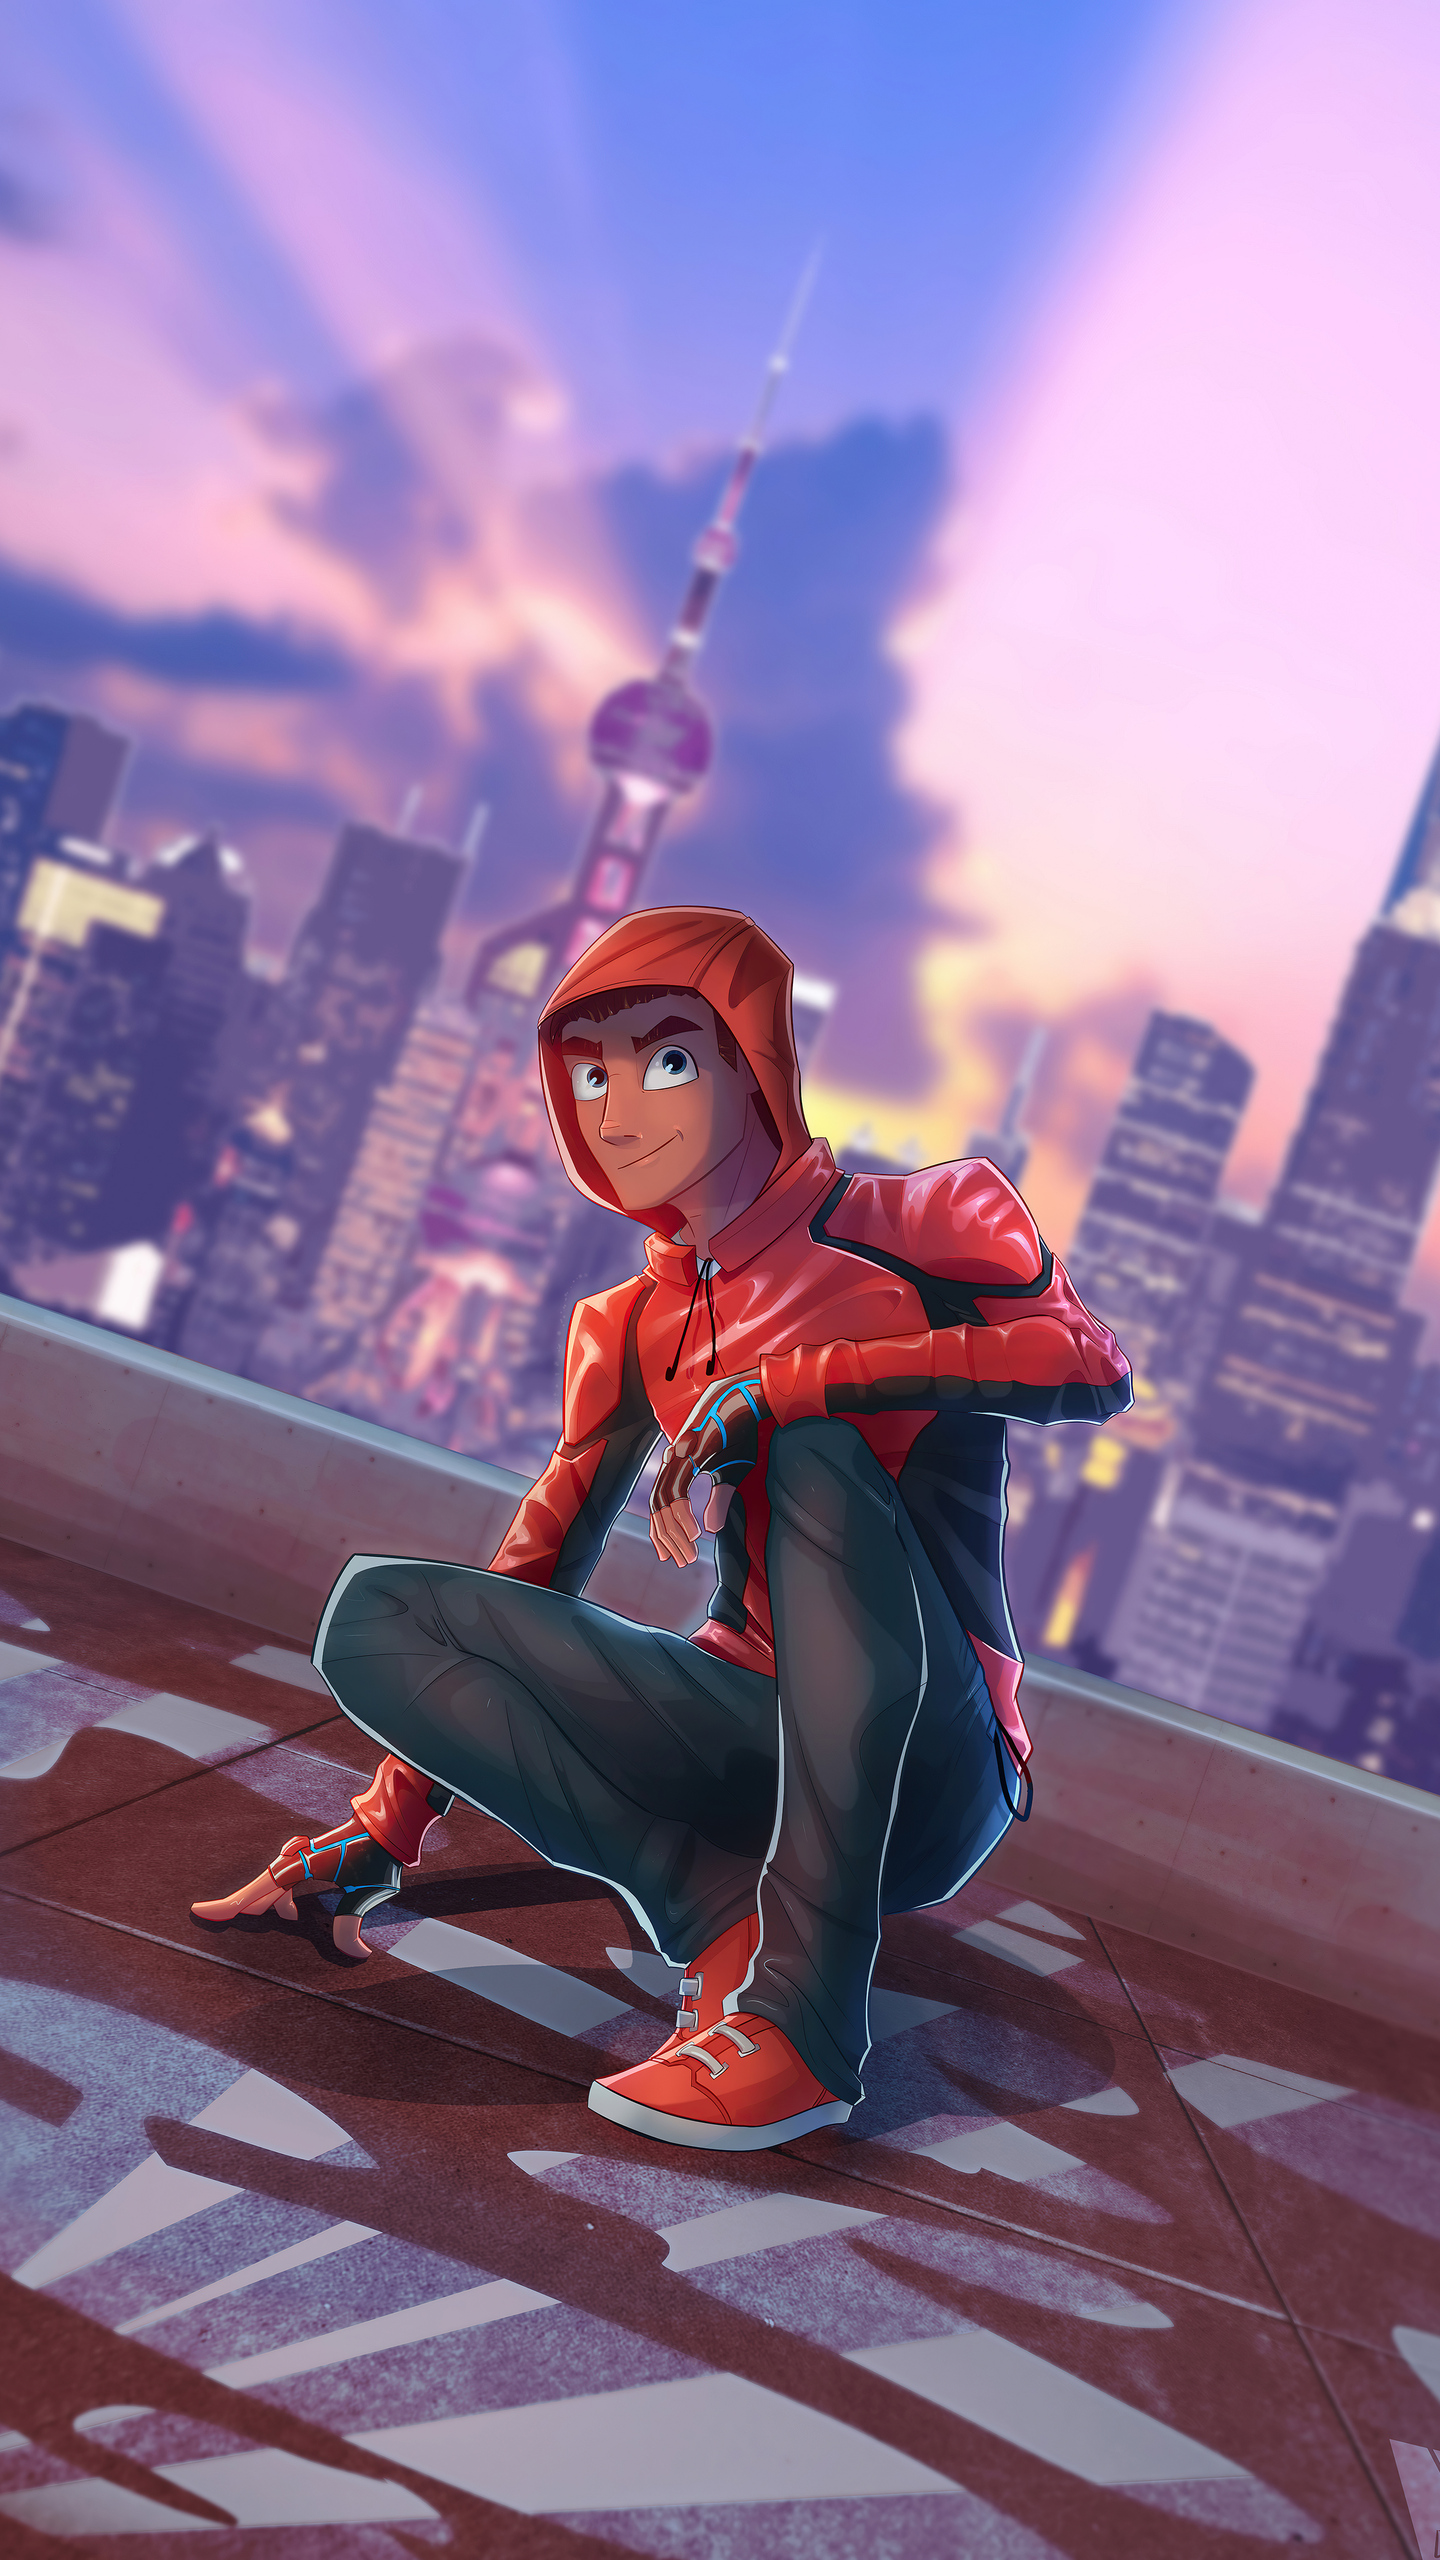 spiderman-on-rooftop-no-mask-5k-8s.jpg